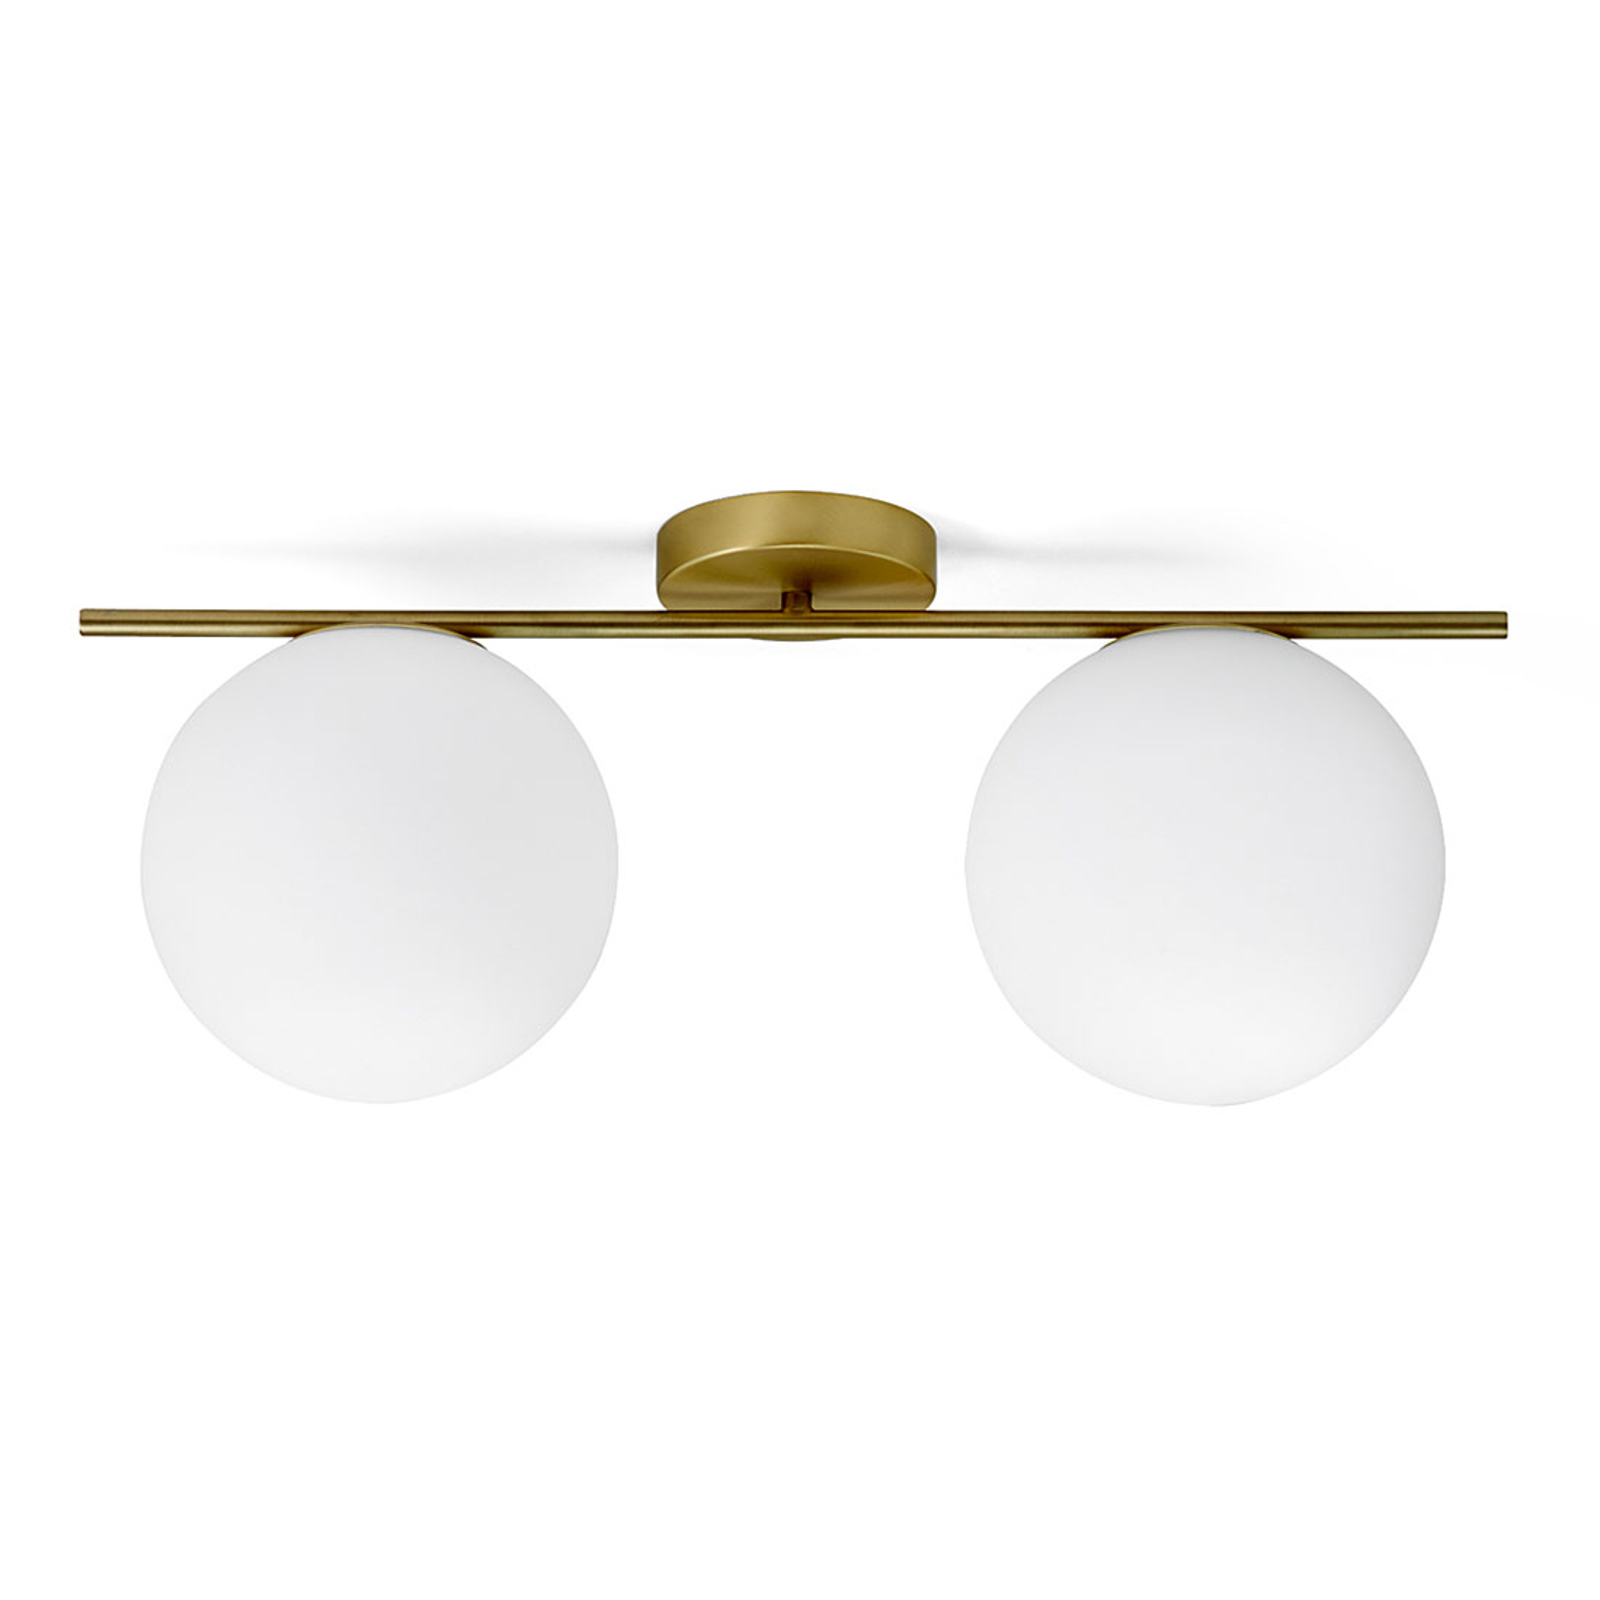 Messing-taklampe Jugen 2 lyskilder horisontal